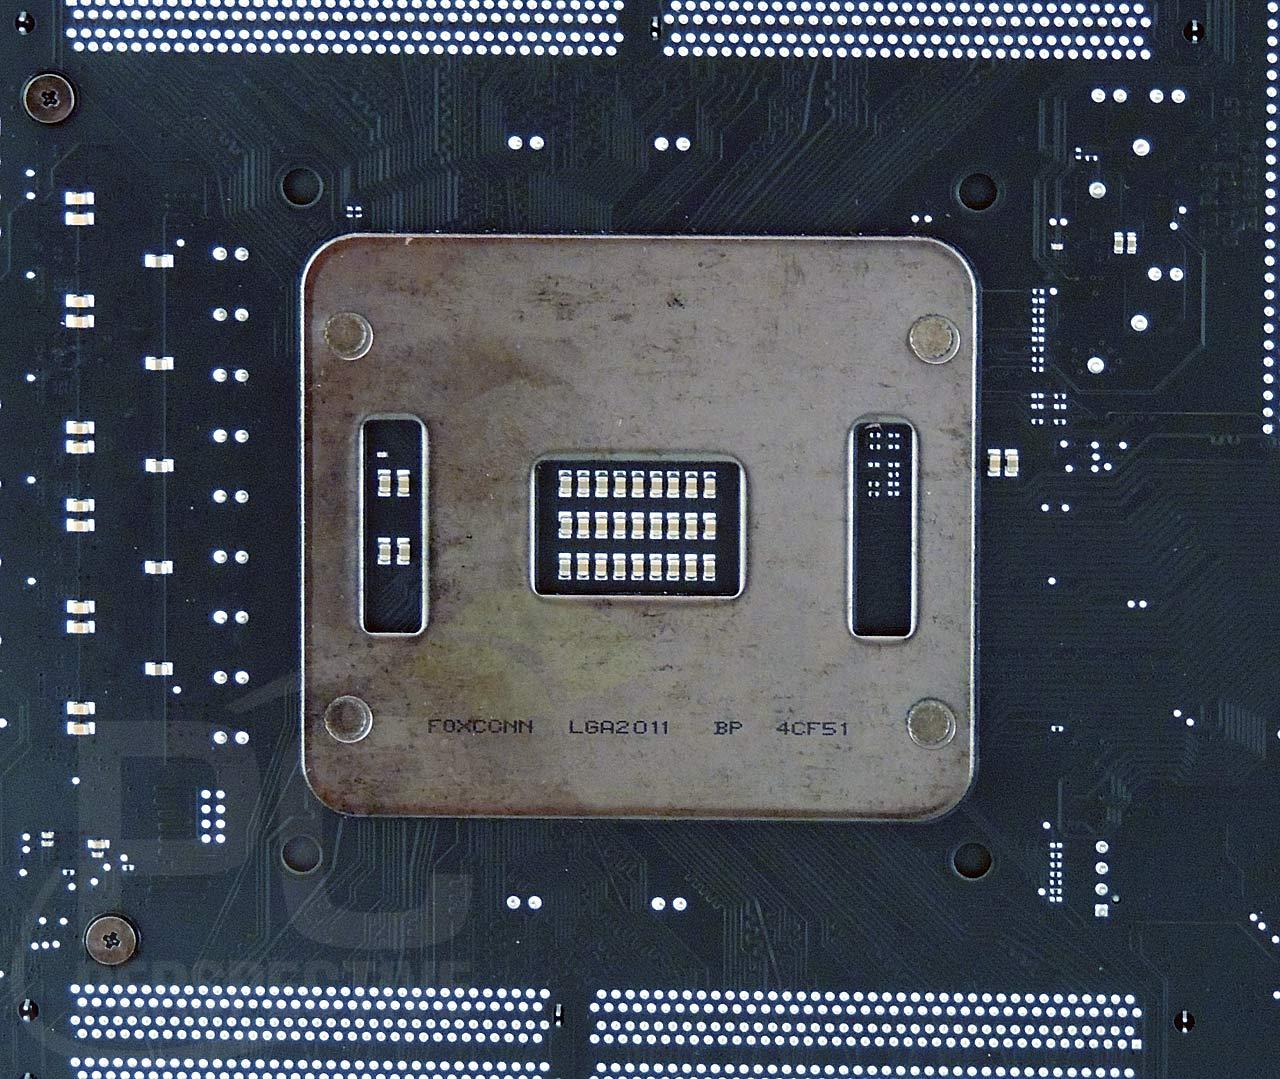 03-board-back-cpu.jpg